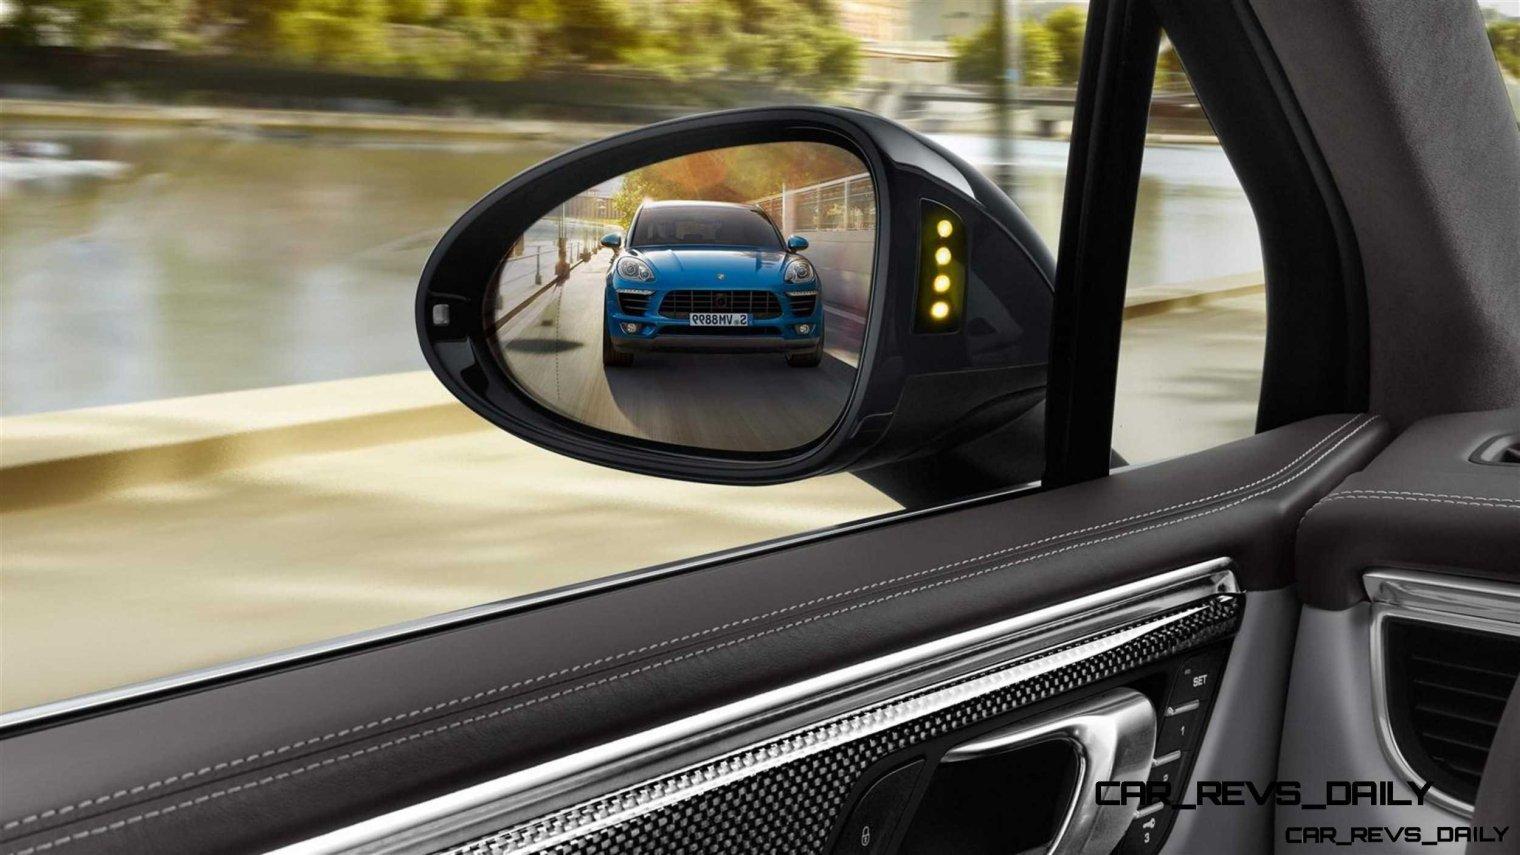 2015 Porsche Macan - Latest Images - CarRevsDaily.com 50